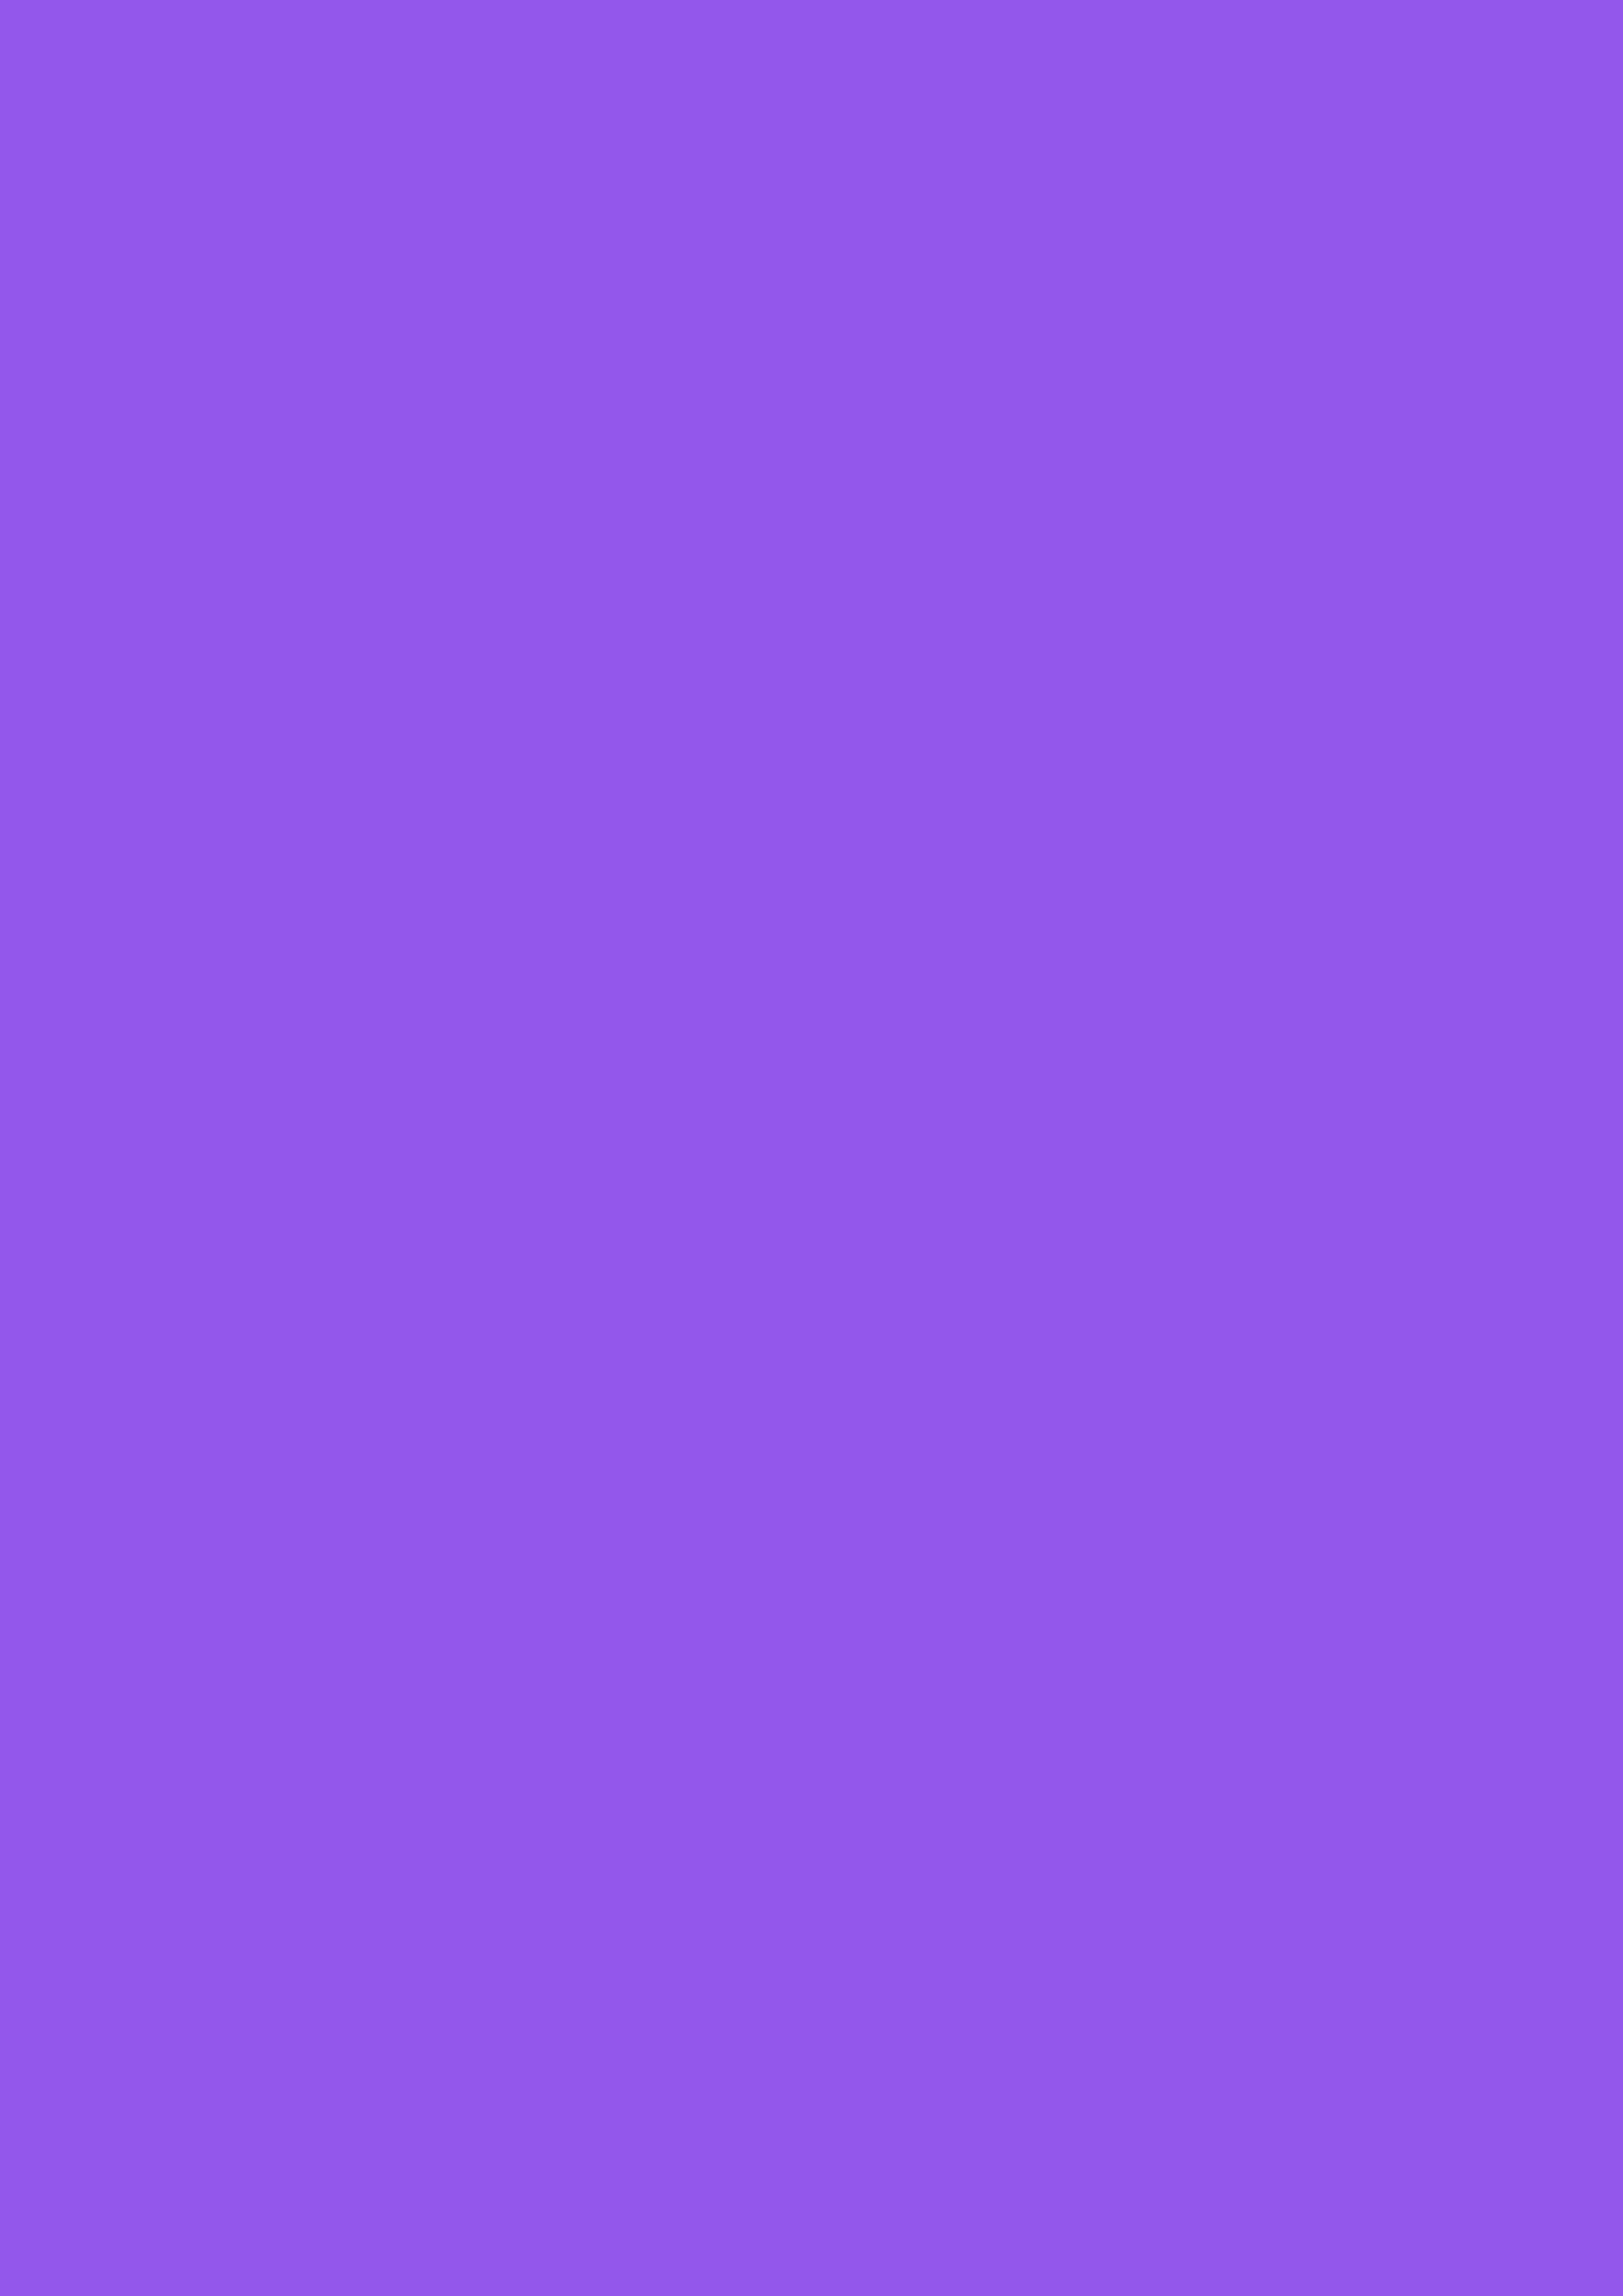 2480x3508 Lavender Indigo Solid Color Background